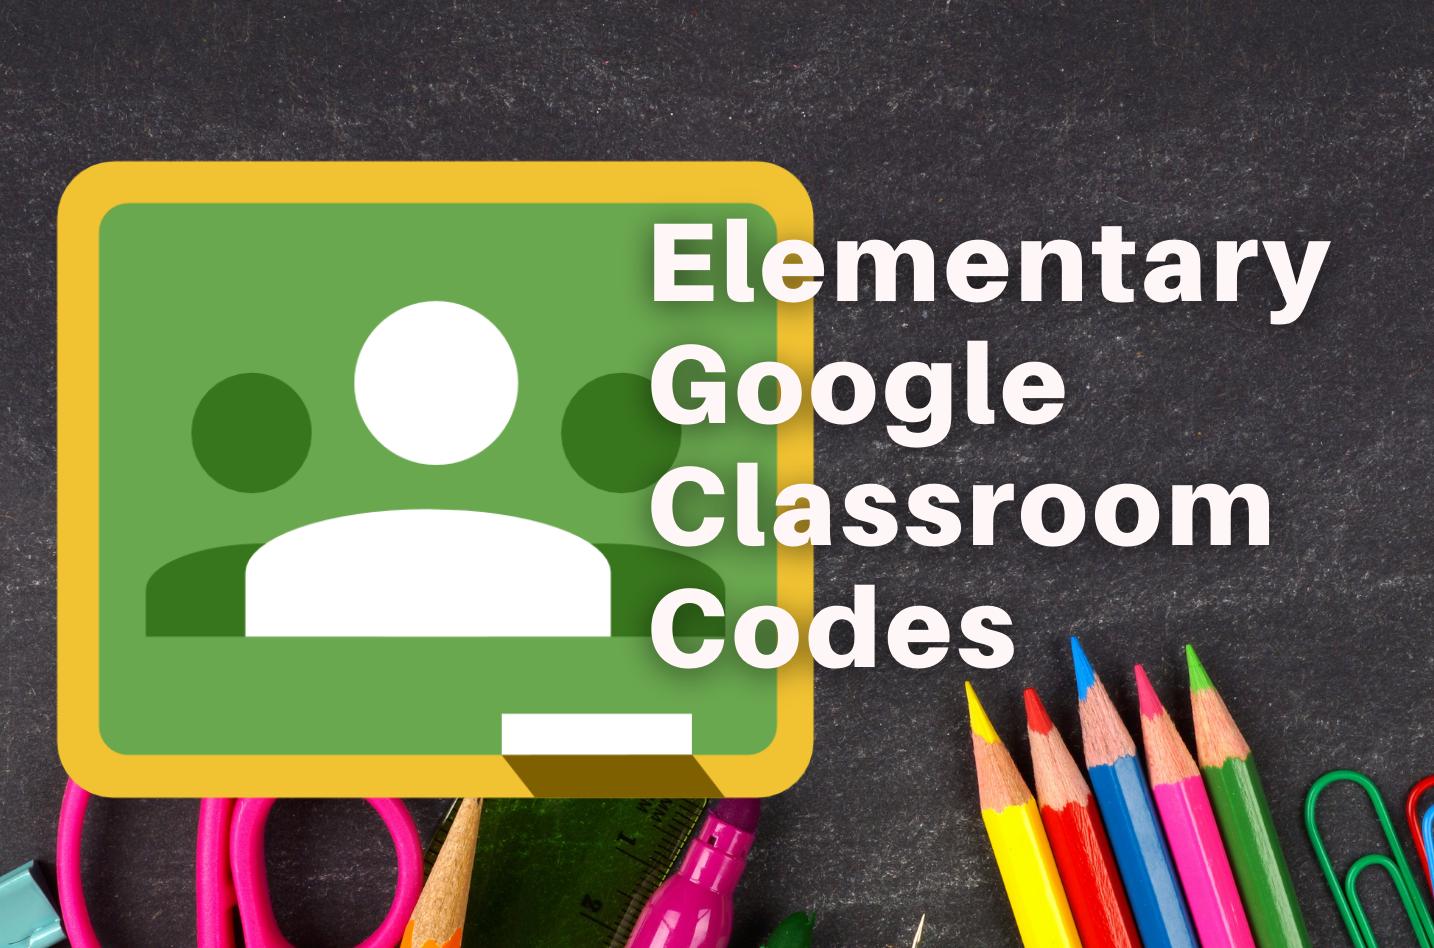 Elementary Google Classroom Class Codes